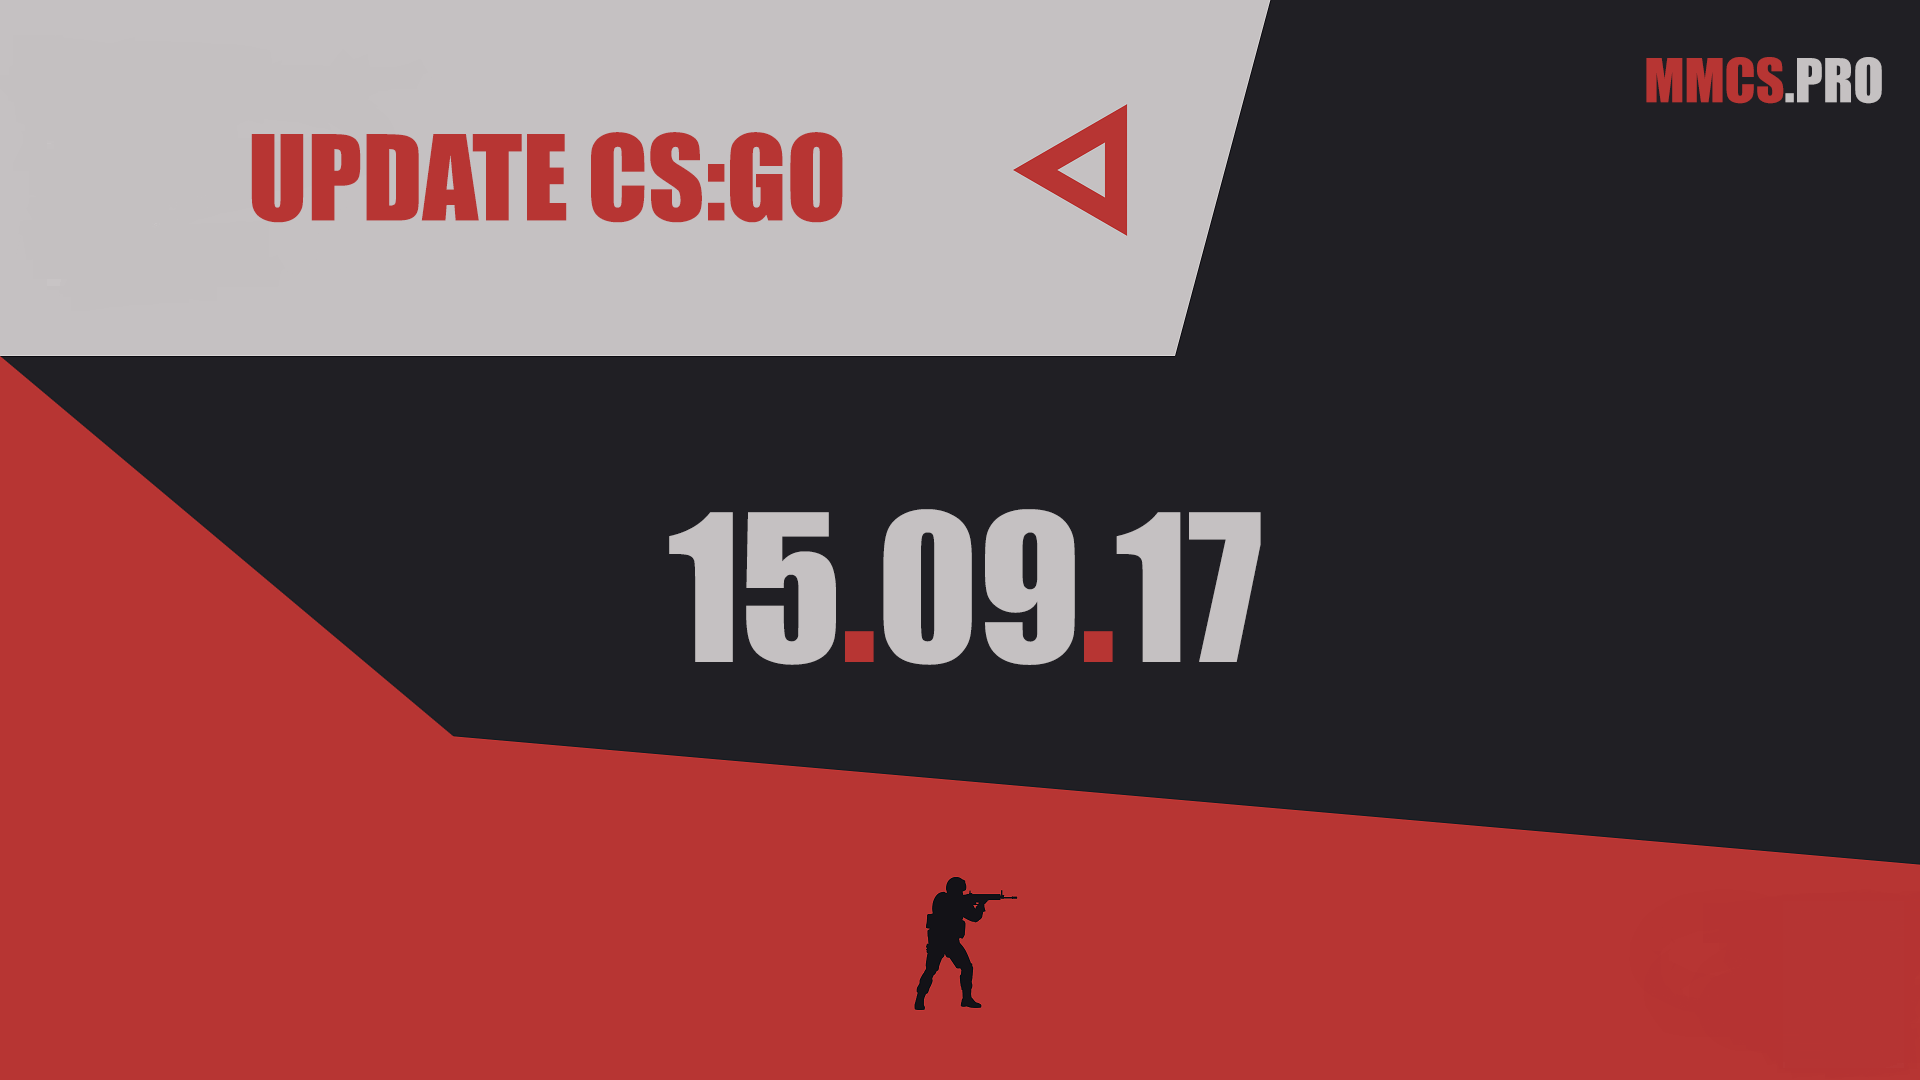 https://mmcs.pro/update-csgo-15-09-2017-valve/